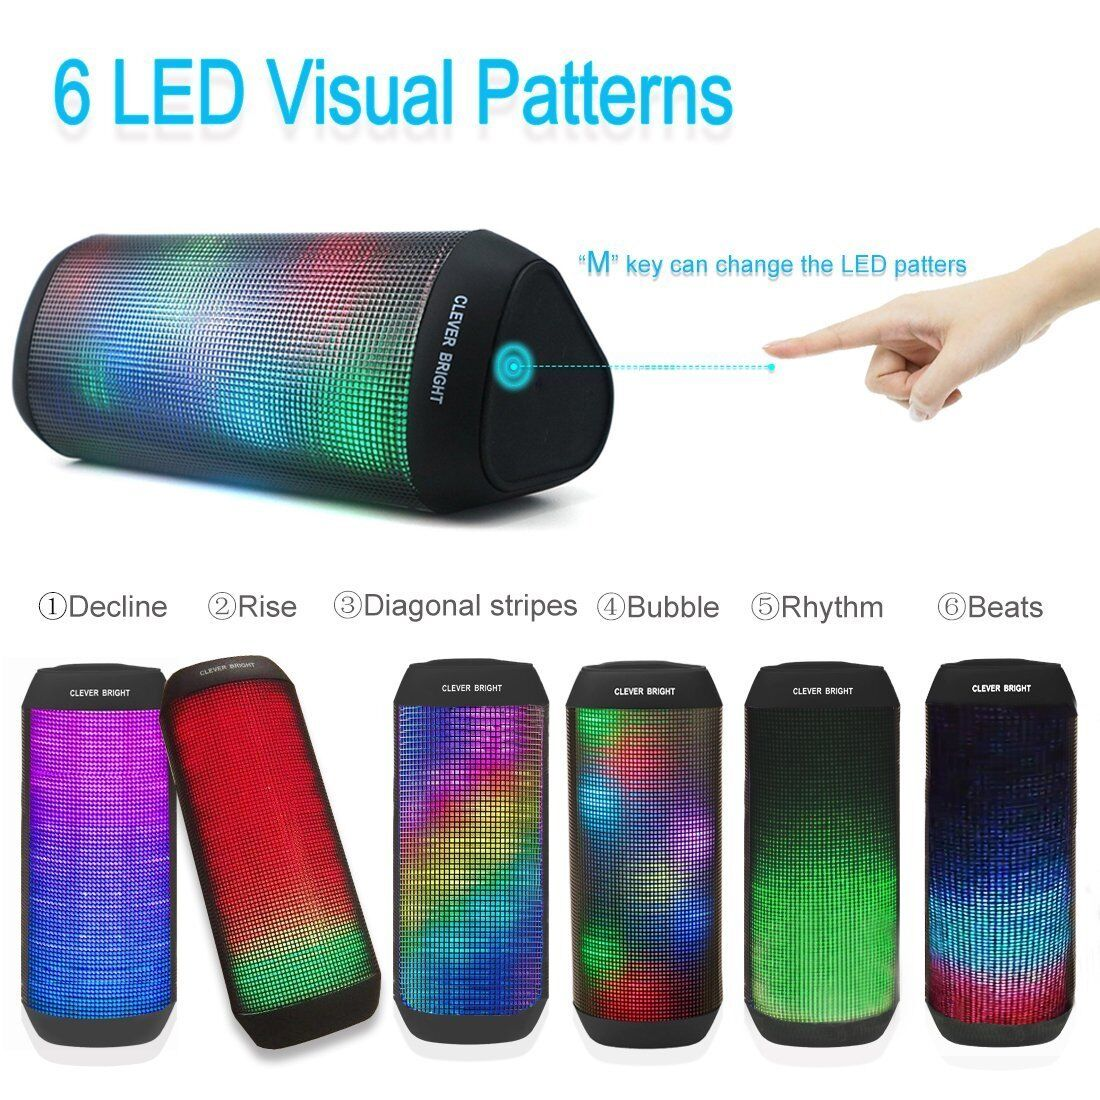 LED Bluetooth Speaker Portable Subwoofer Super Bass Stereo Loudspeakers